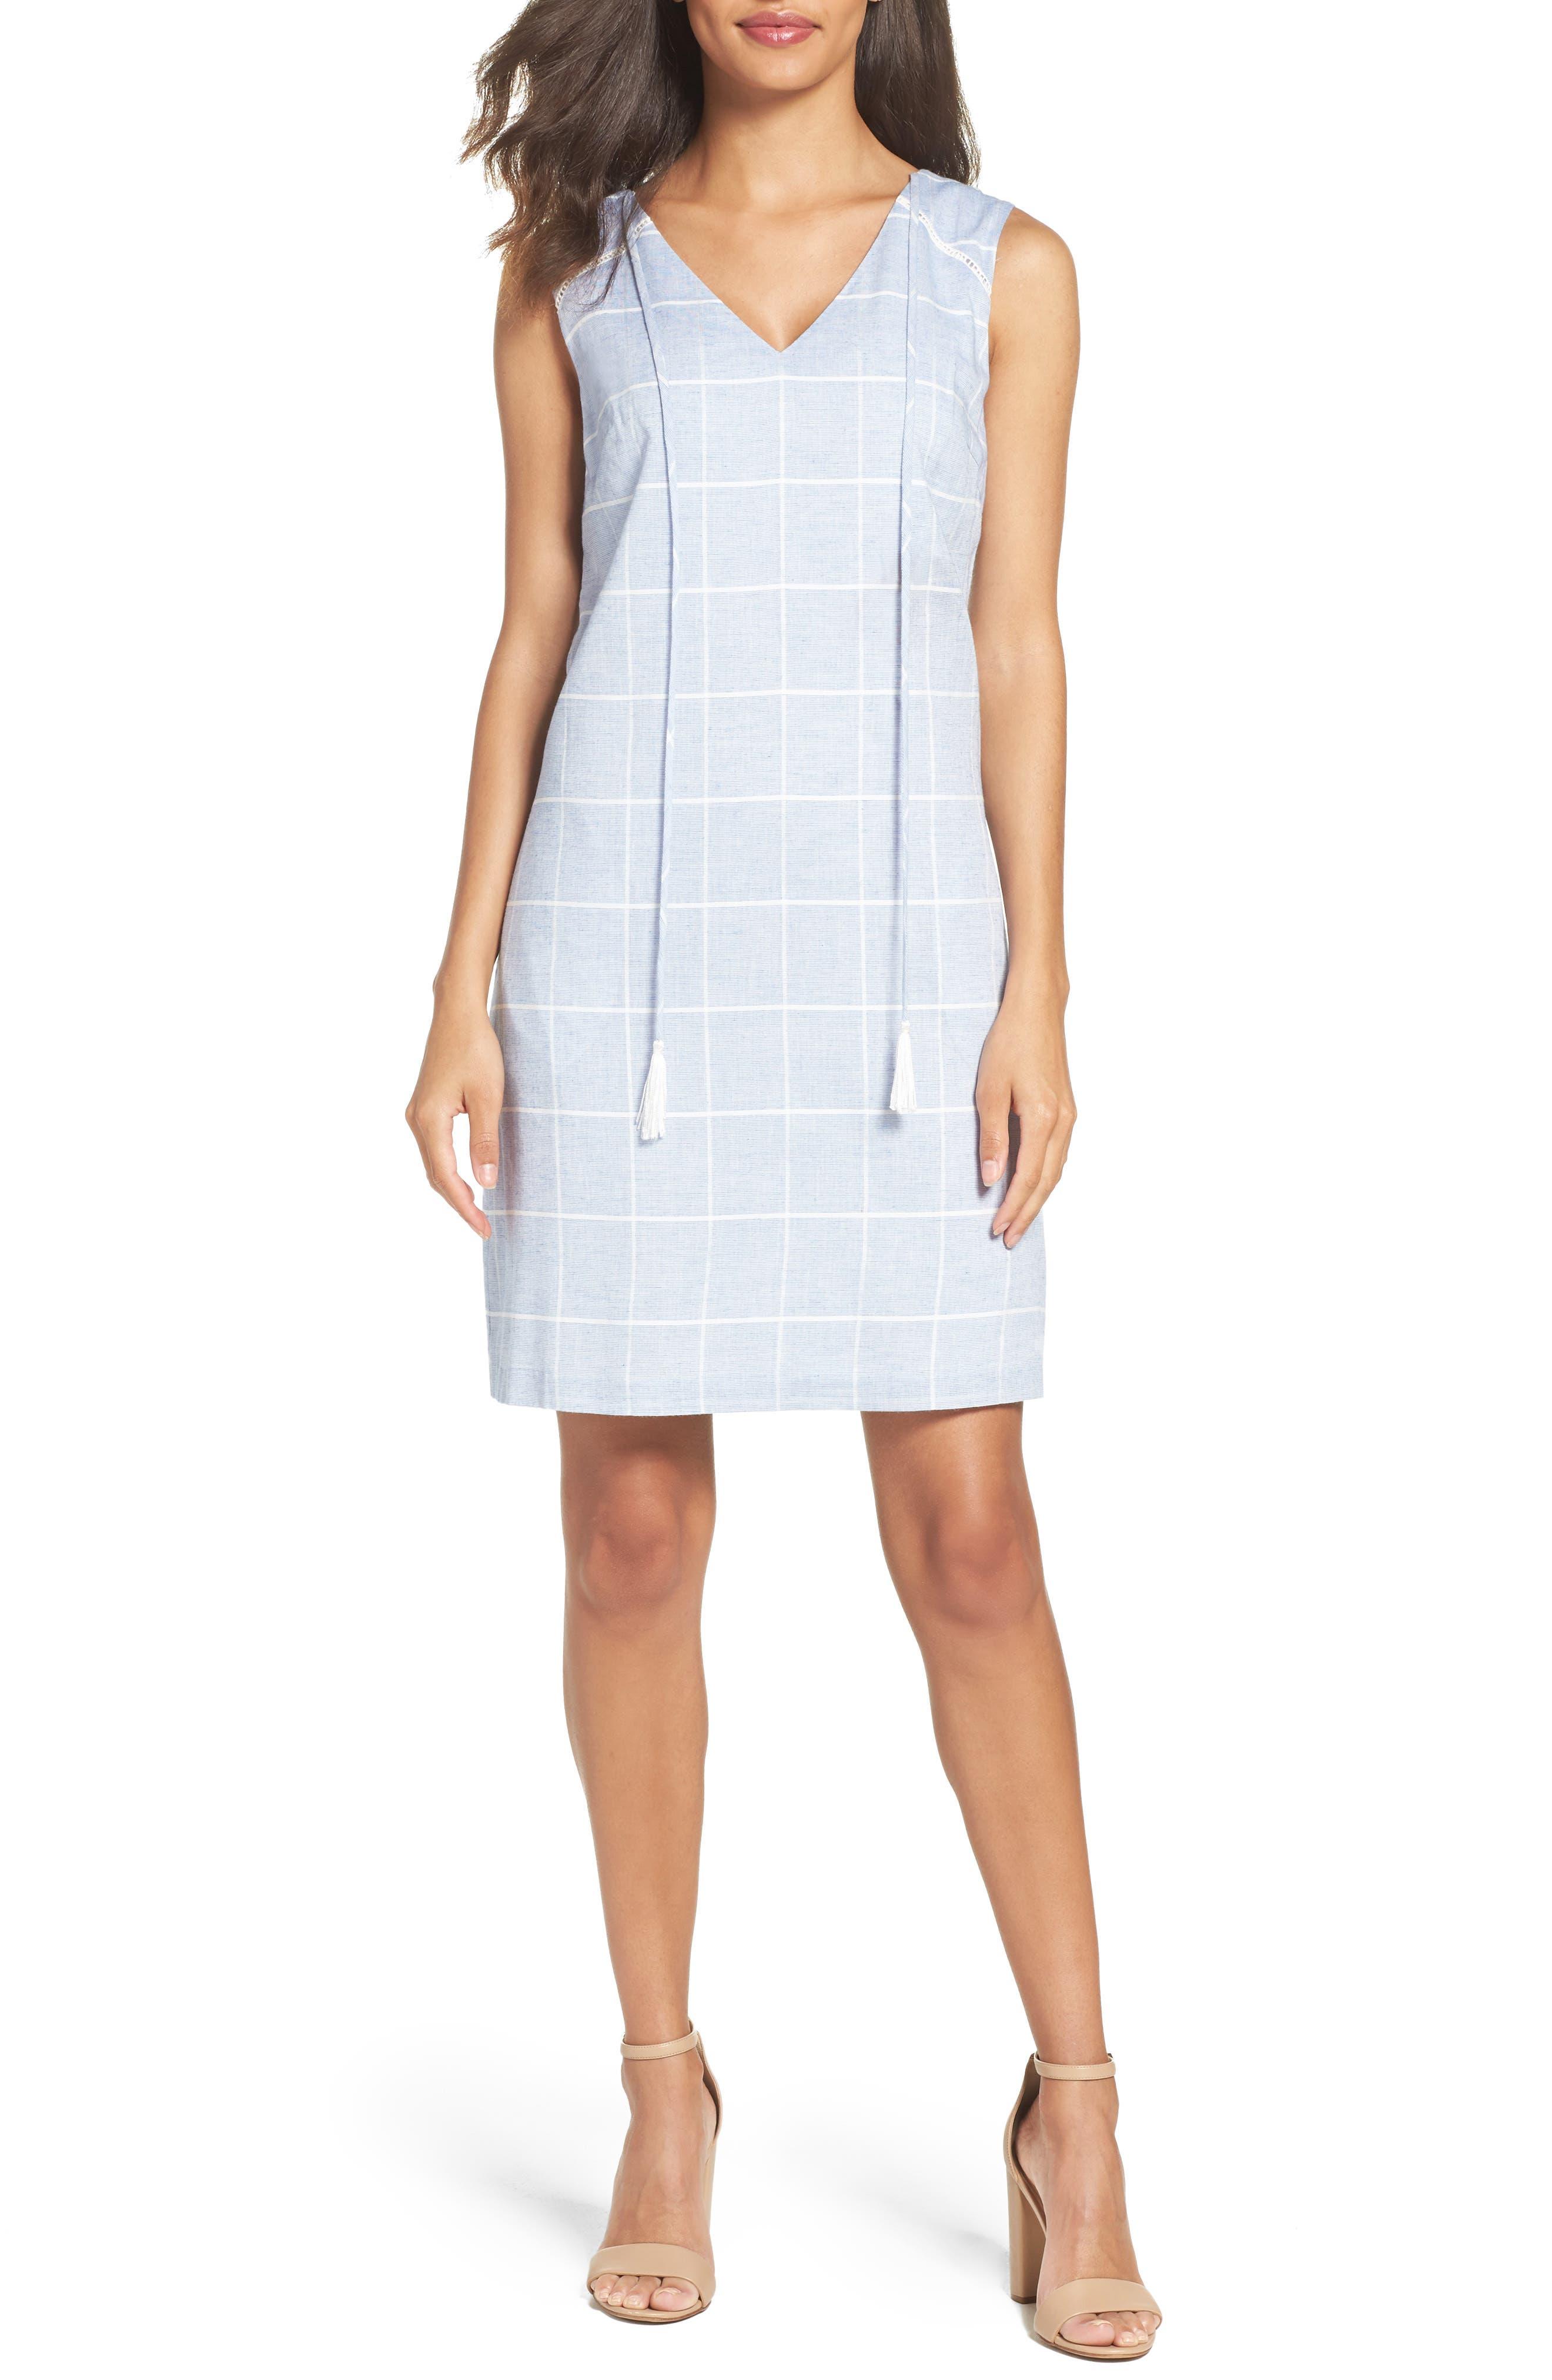 Alternate Image 1 Selected - Julia Jordan Cotton A-Line Dress